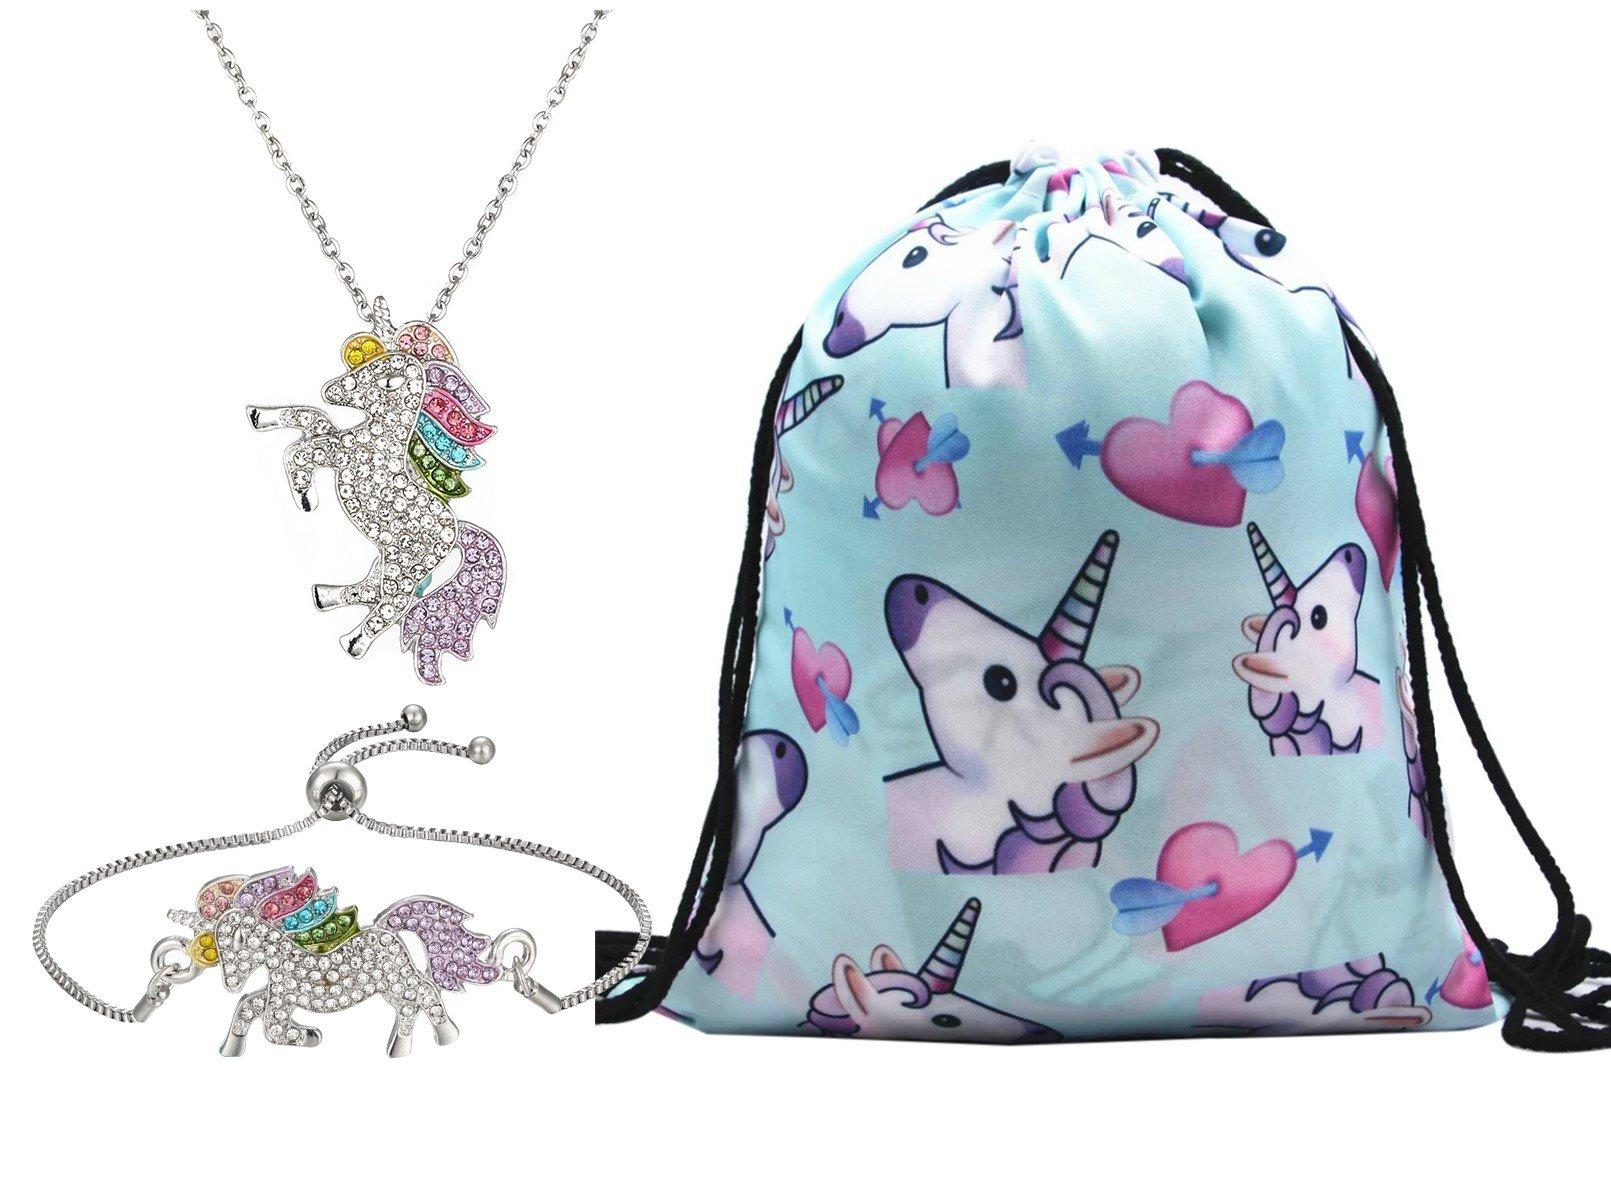 Unicorn Gifts for Girls 3 Pack - Unicorn Drawstring Backpack/Necklace/Bracelet (Blue)